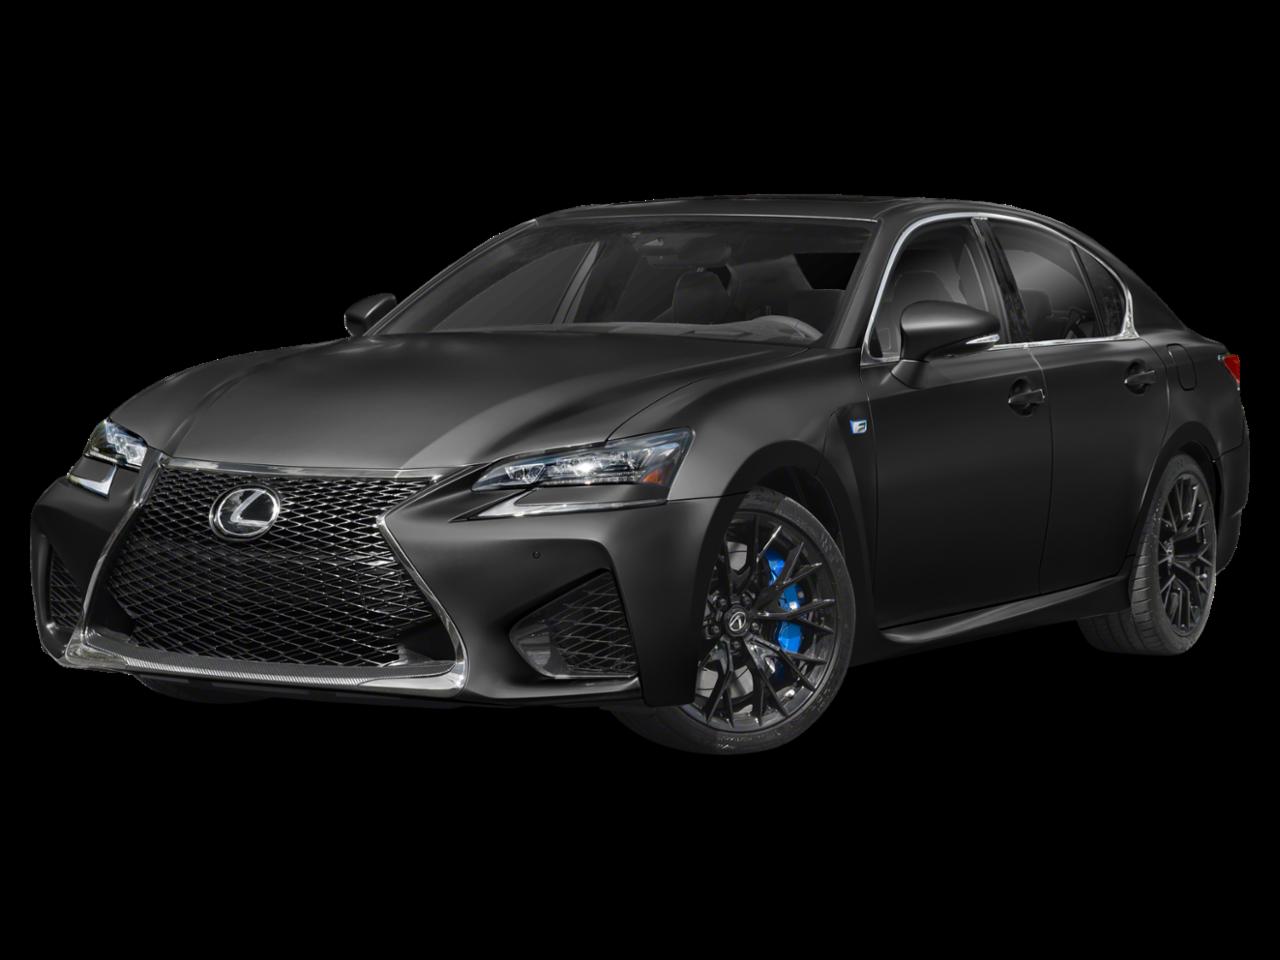 Lexus 2020 GS F RWD